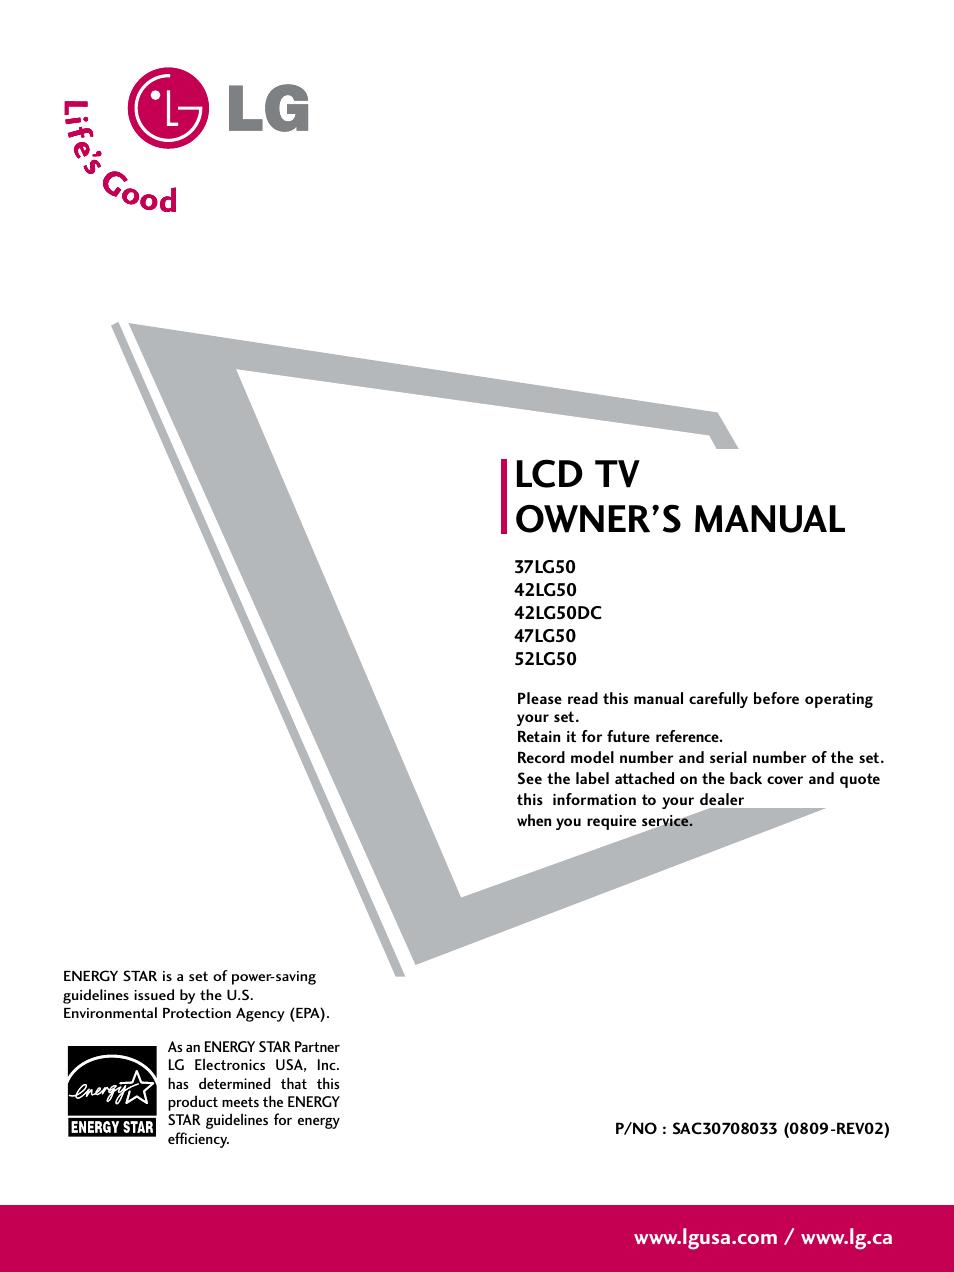 lg 47lg50 ug user manual 114 pages rh manualsdir com lg 32ld310 lcd tv service manual lg lcd tv service manual pdf